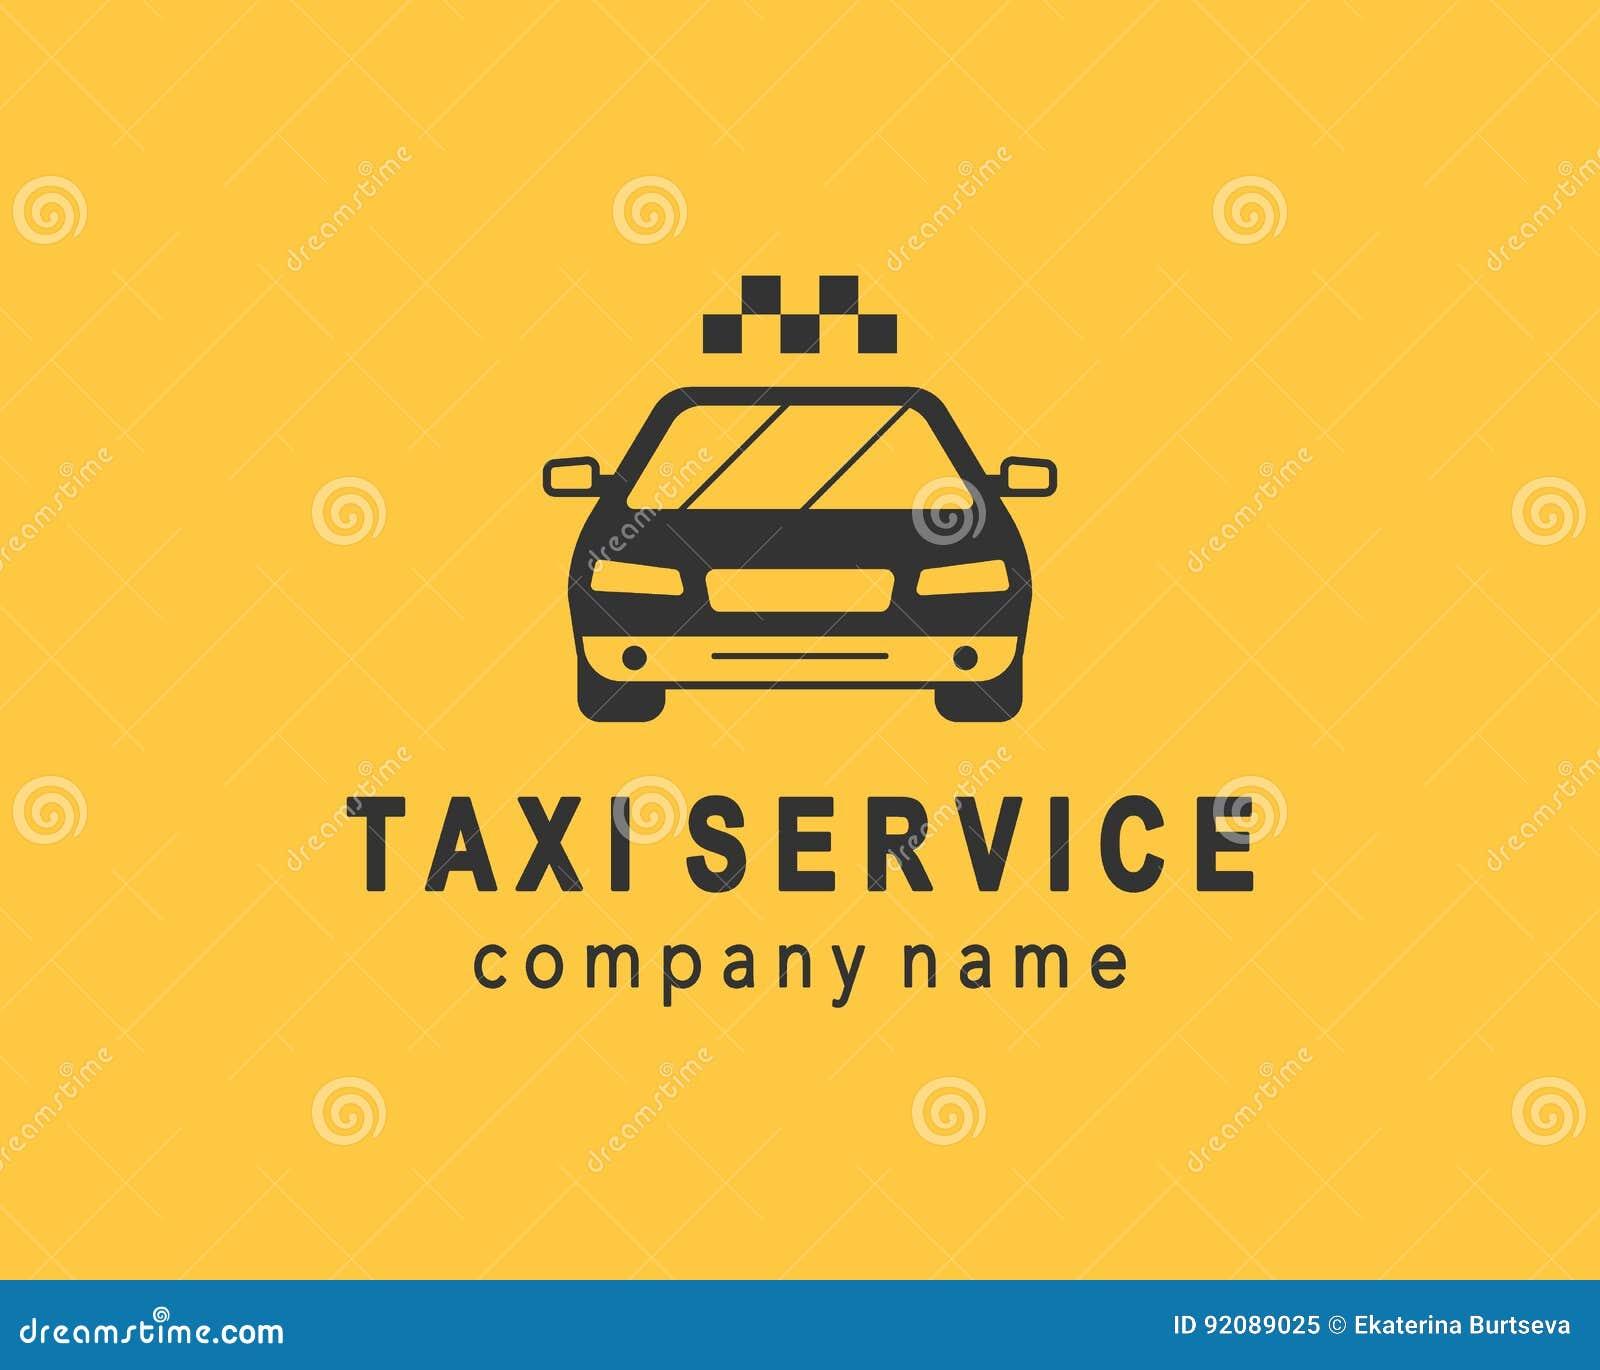 taxi website template